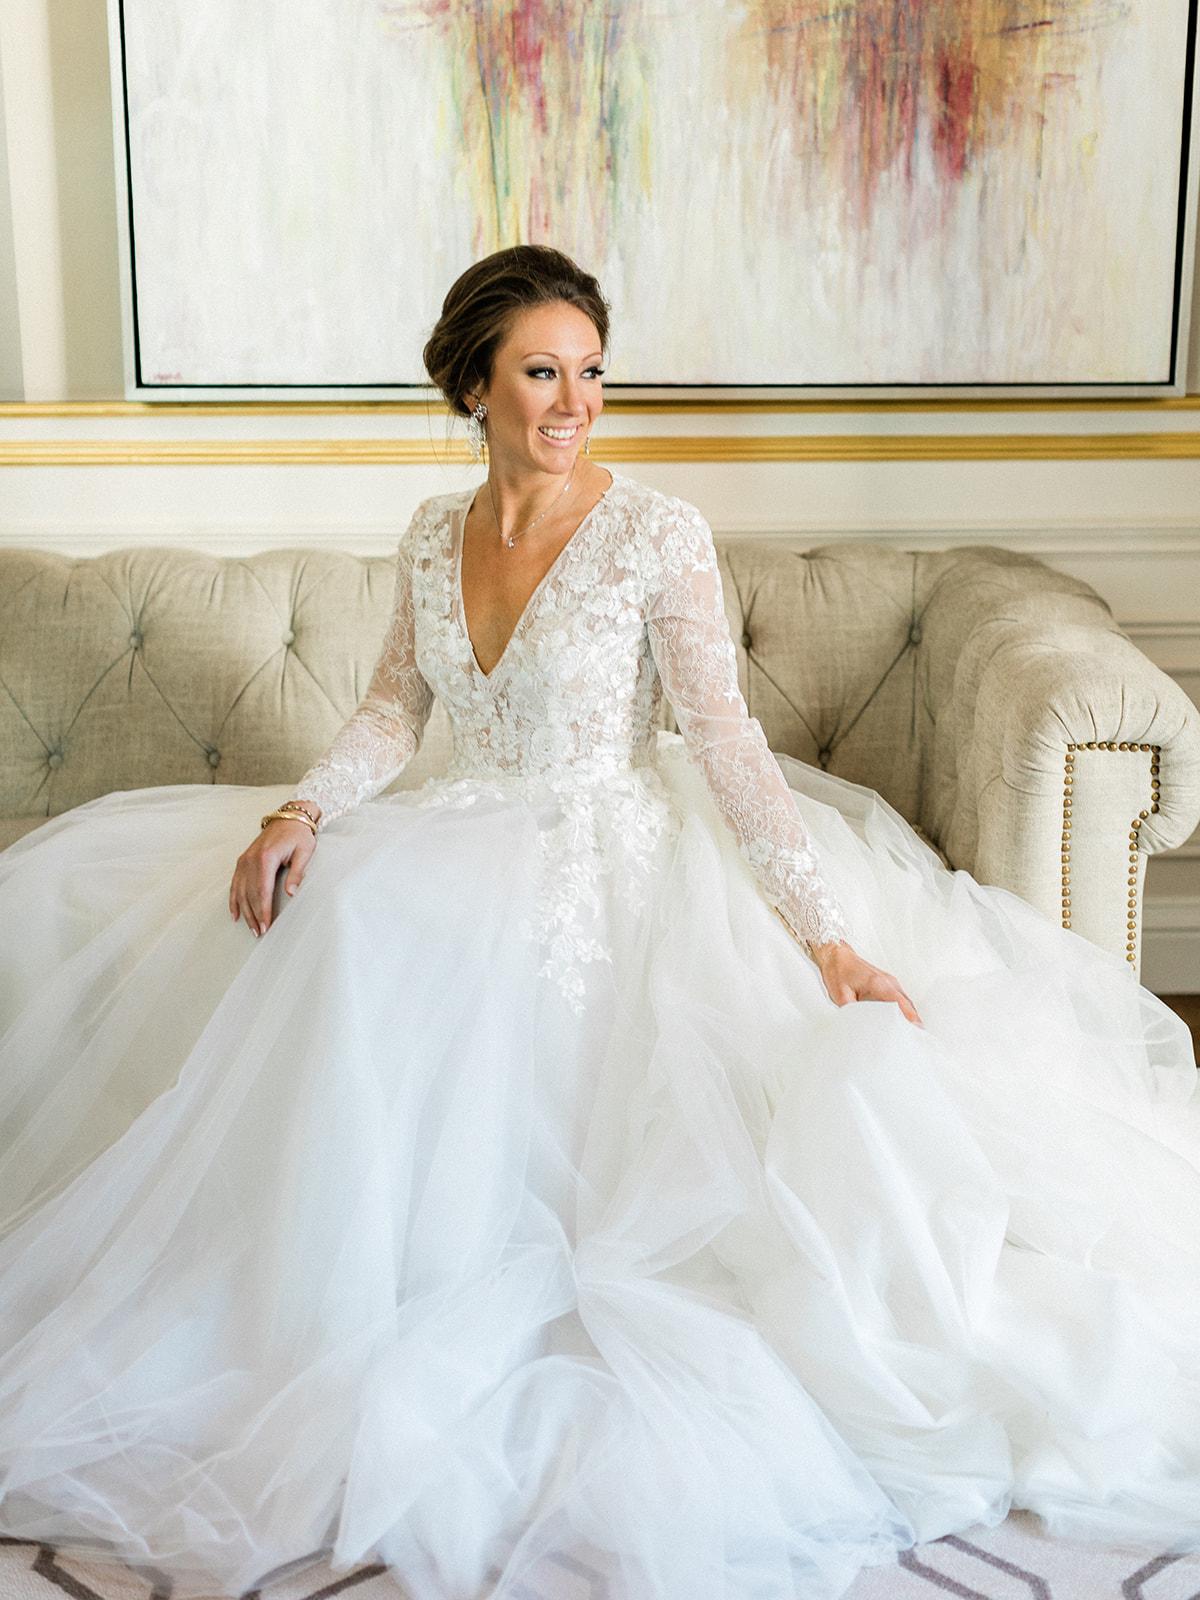 ashergardner-st-regis-nyc-wedding-00011_websize.jpg